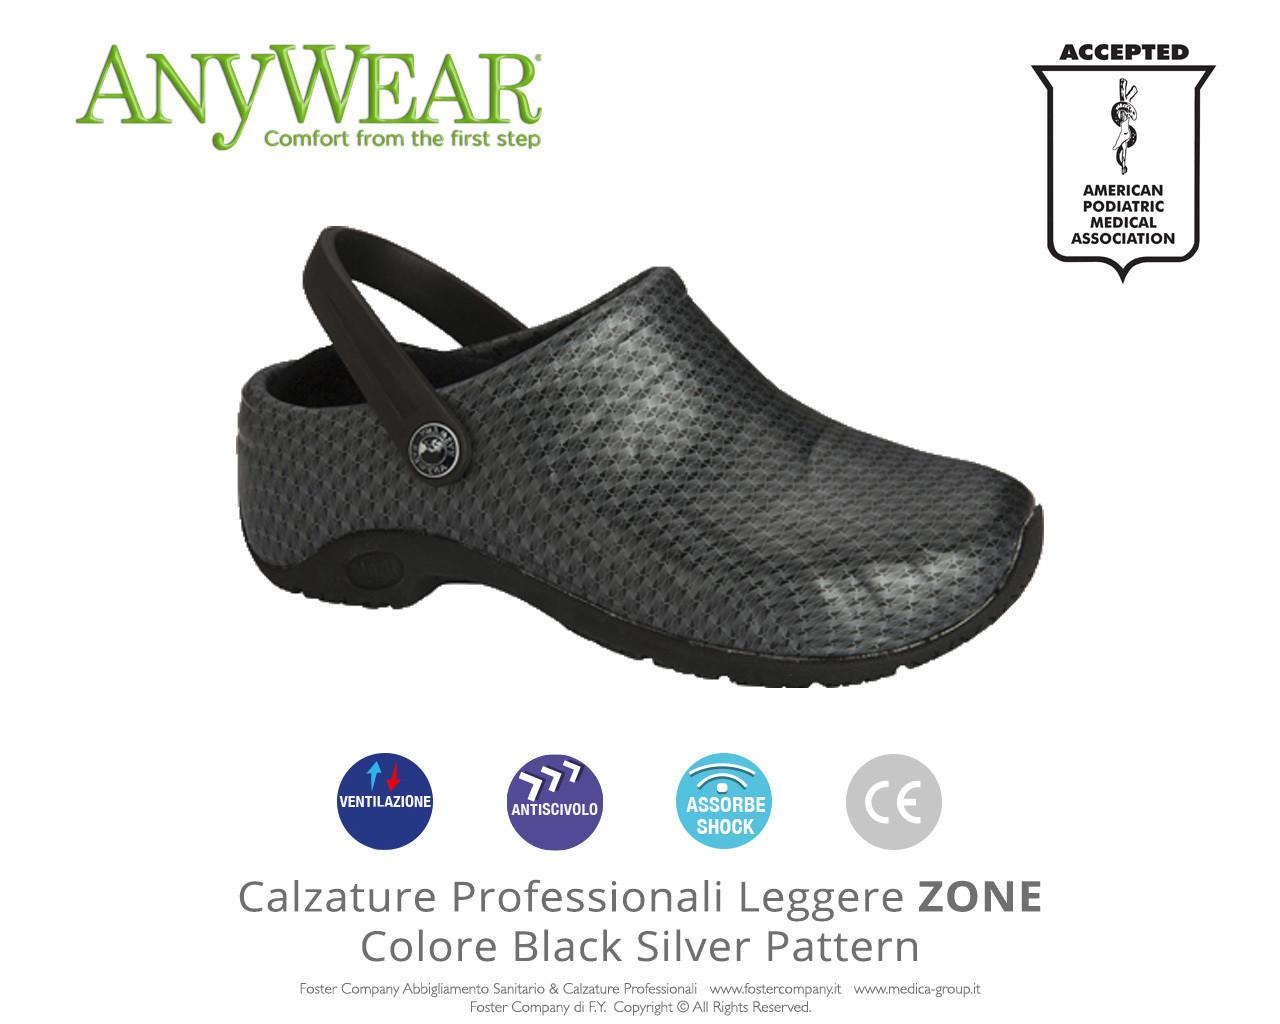 Calzature Professionali Anywear ZONE Colore Black Silver Pattern